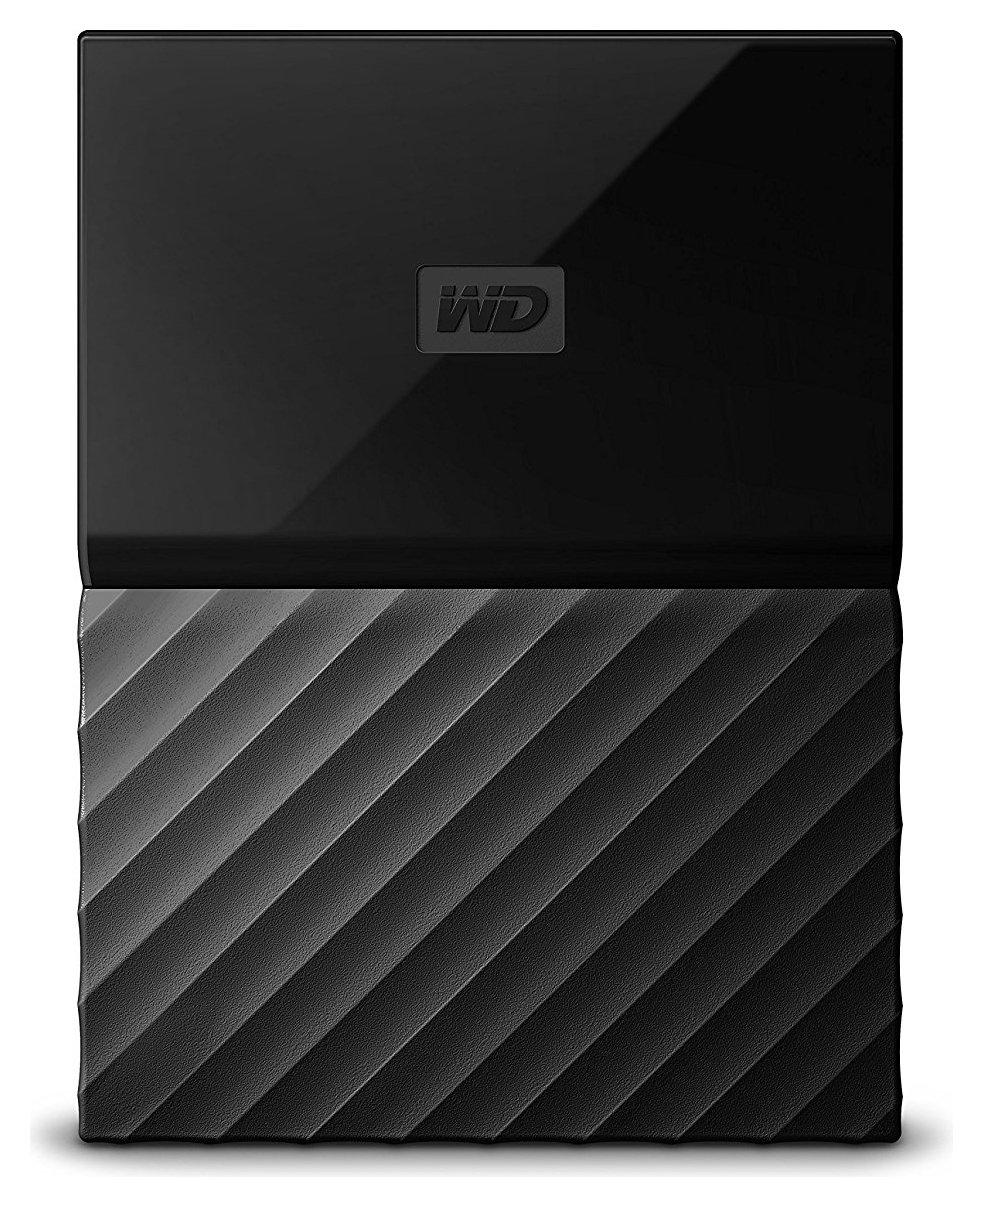 WD My Passport 1TB Portable Hard Drive - Black